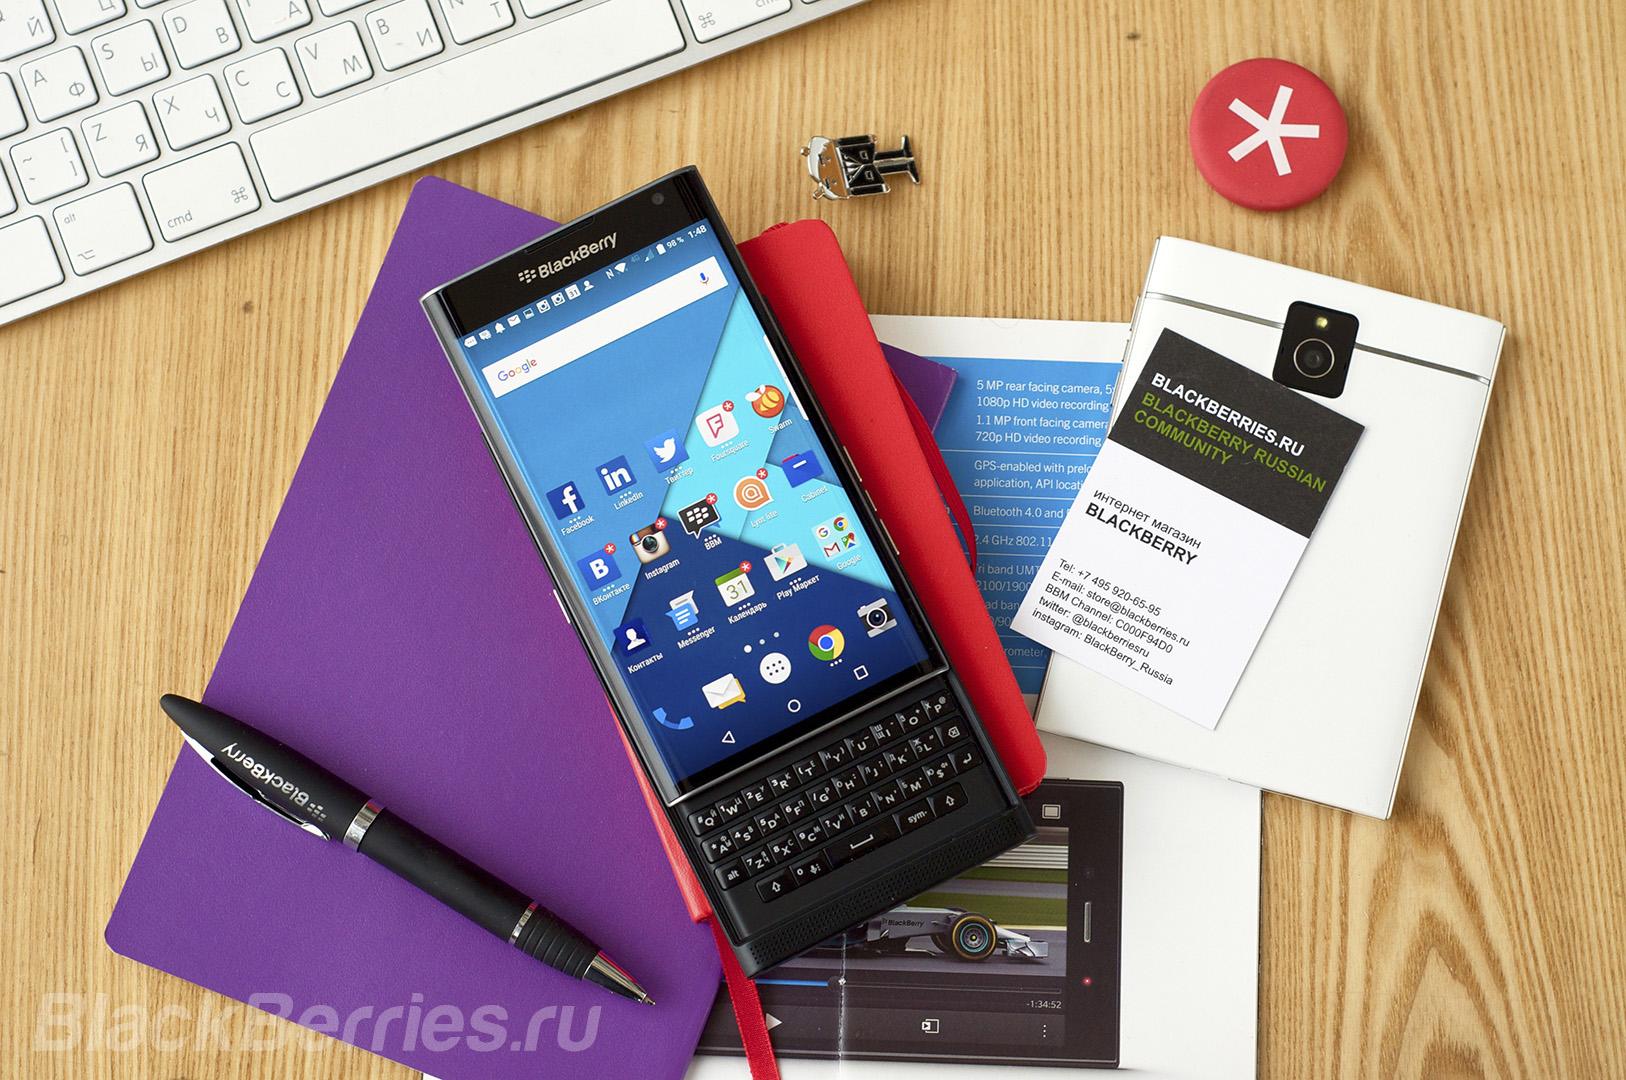 BlackBerry-Priv-Review-012